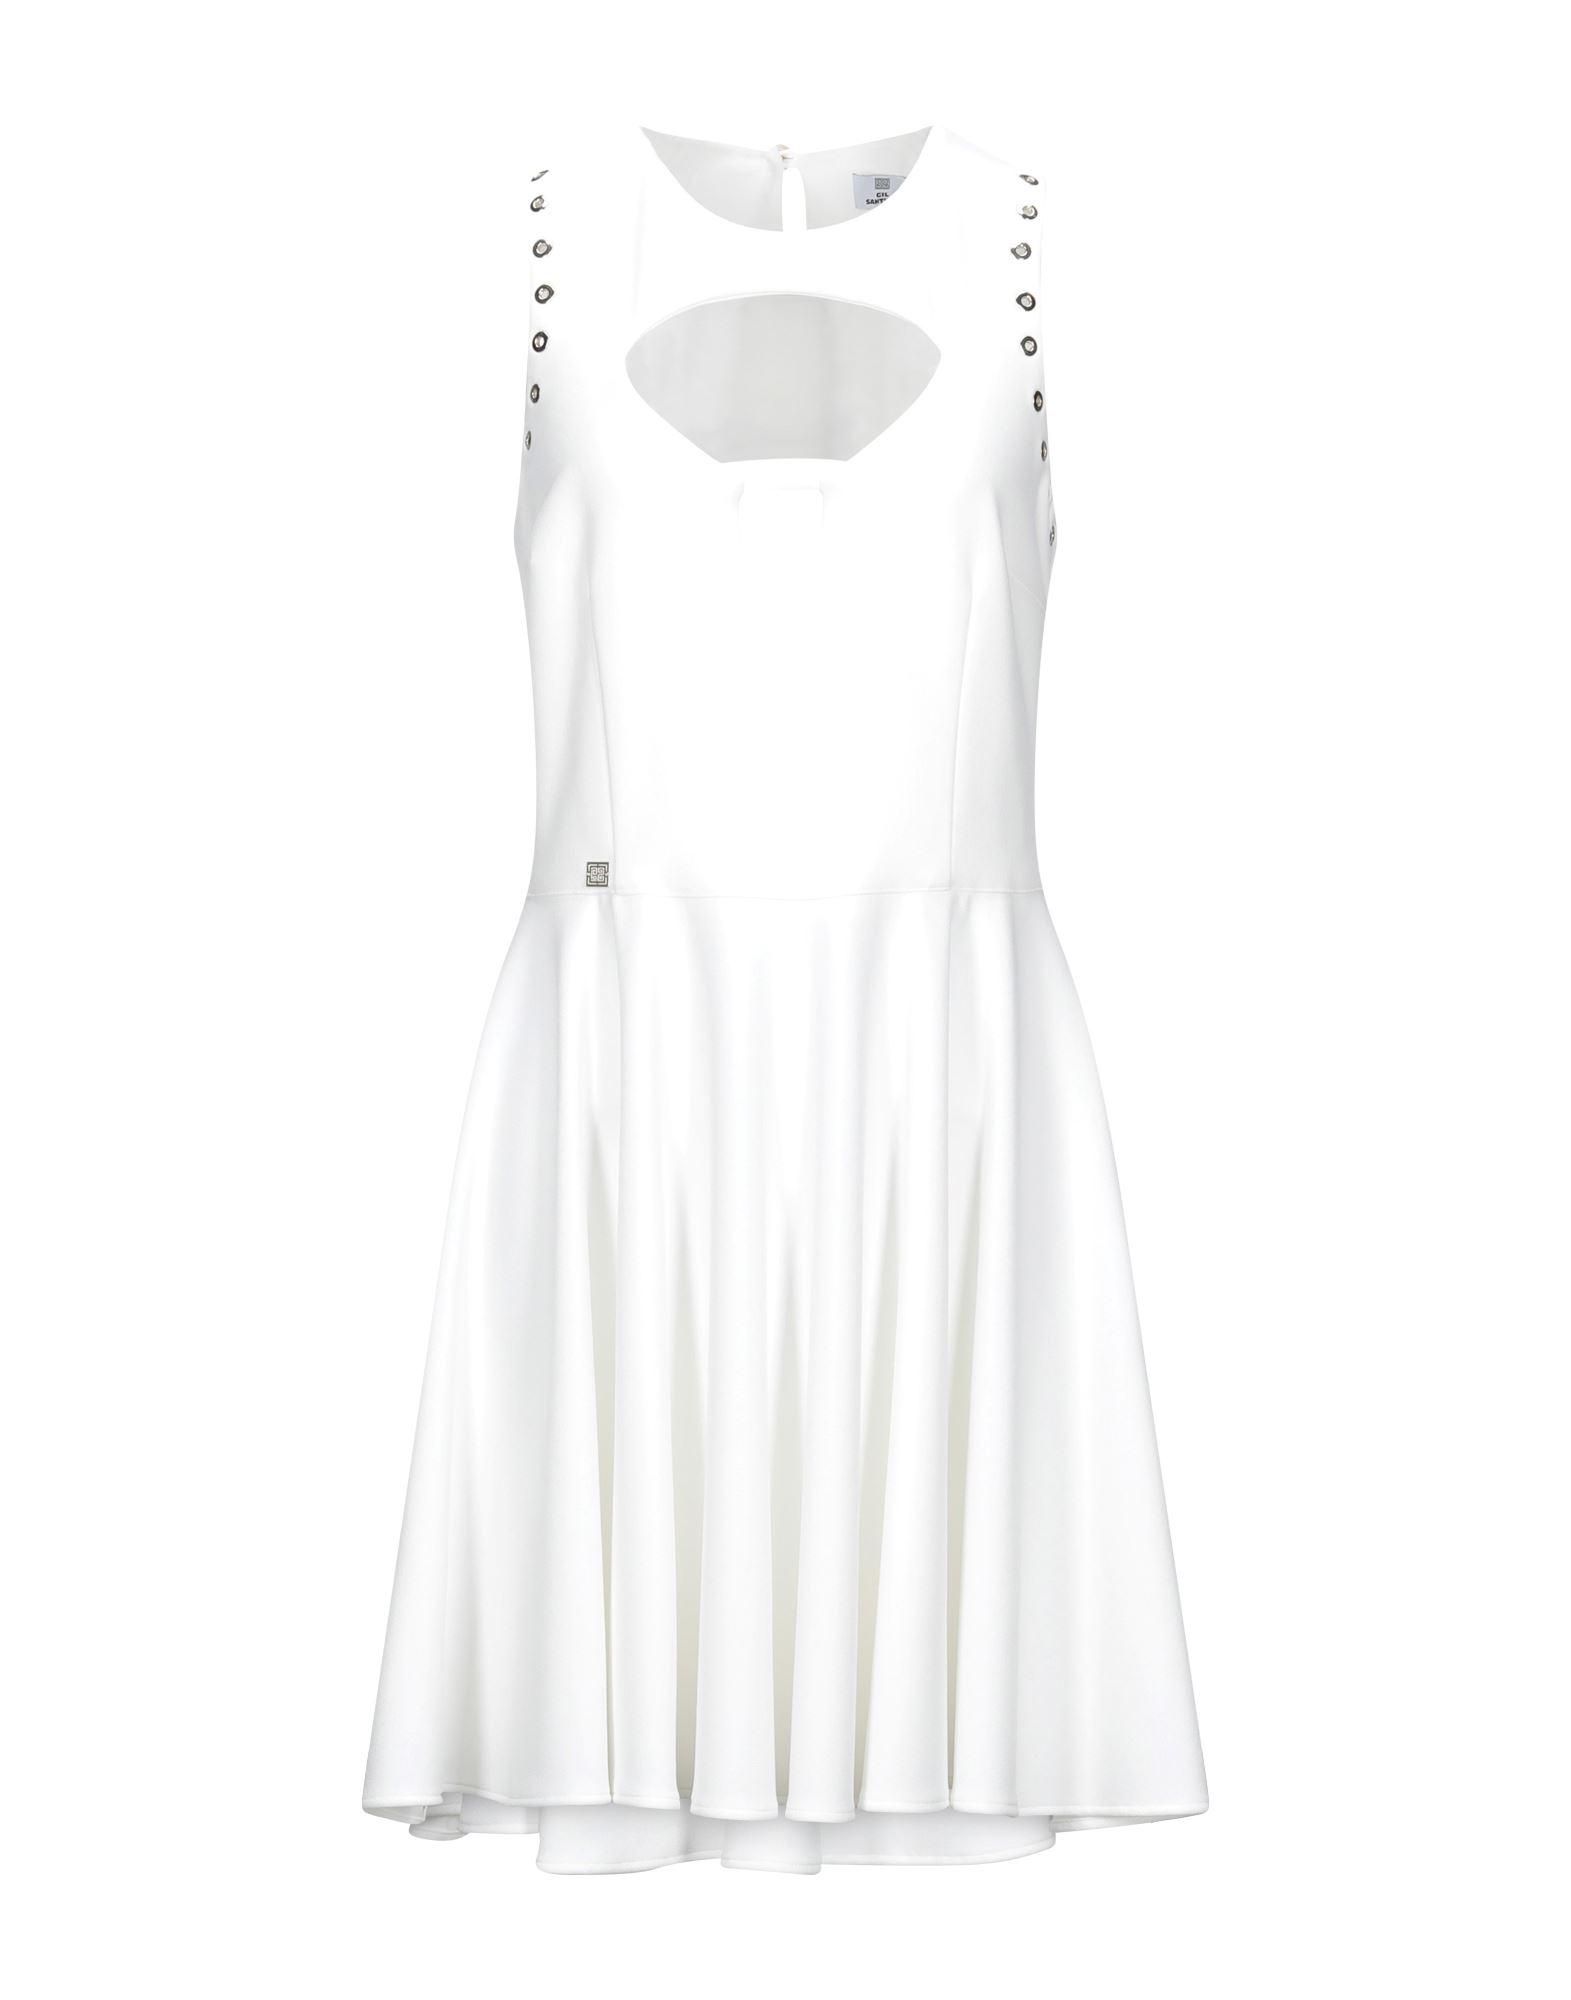 Фото - GIL SANTUCCI Короткое платье gil santucci комбинезоны без бретелей